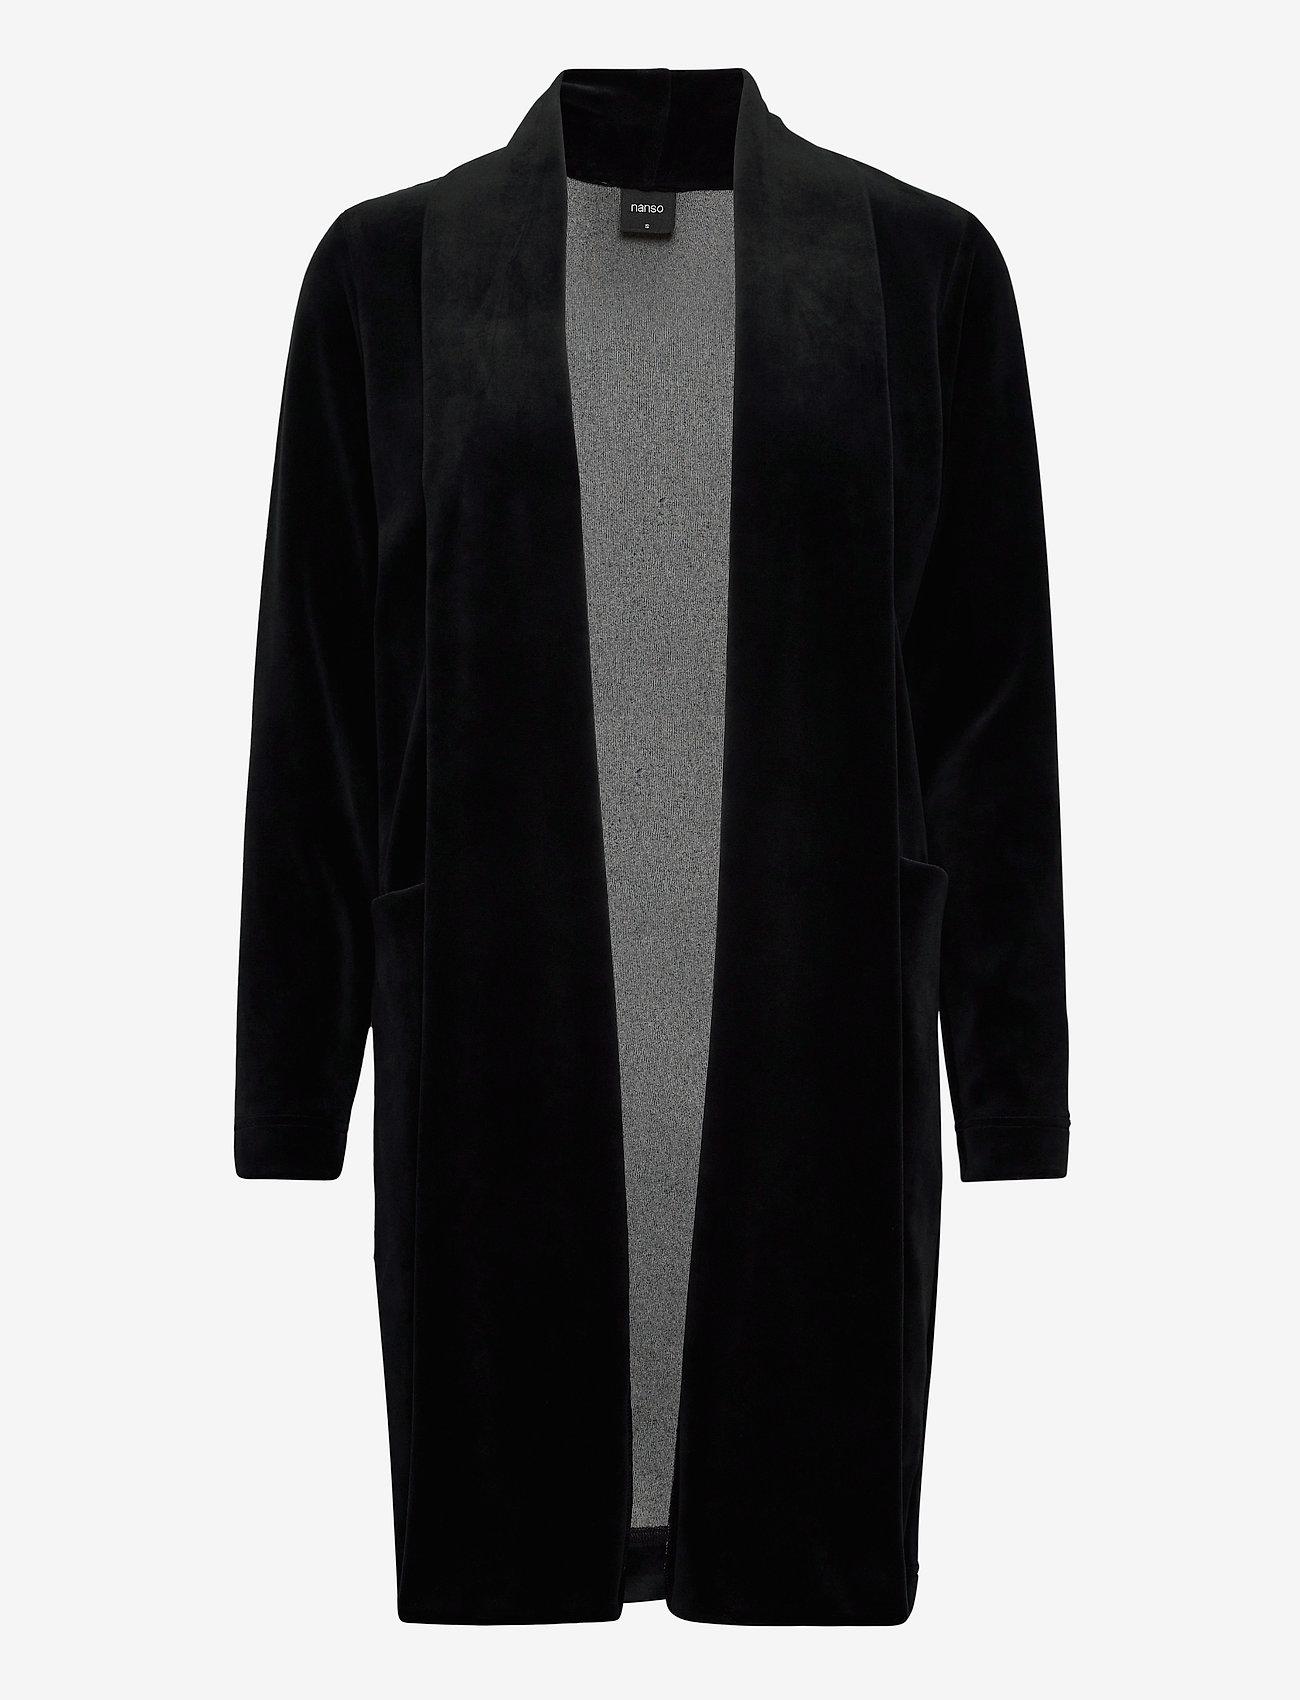 Nanso - Ladies dressing gown, Vivia - bathrobes - black - 0